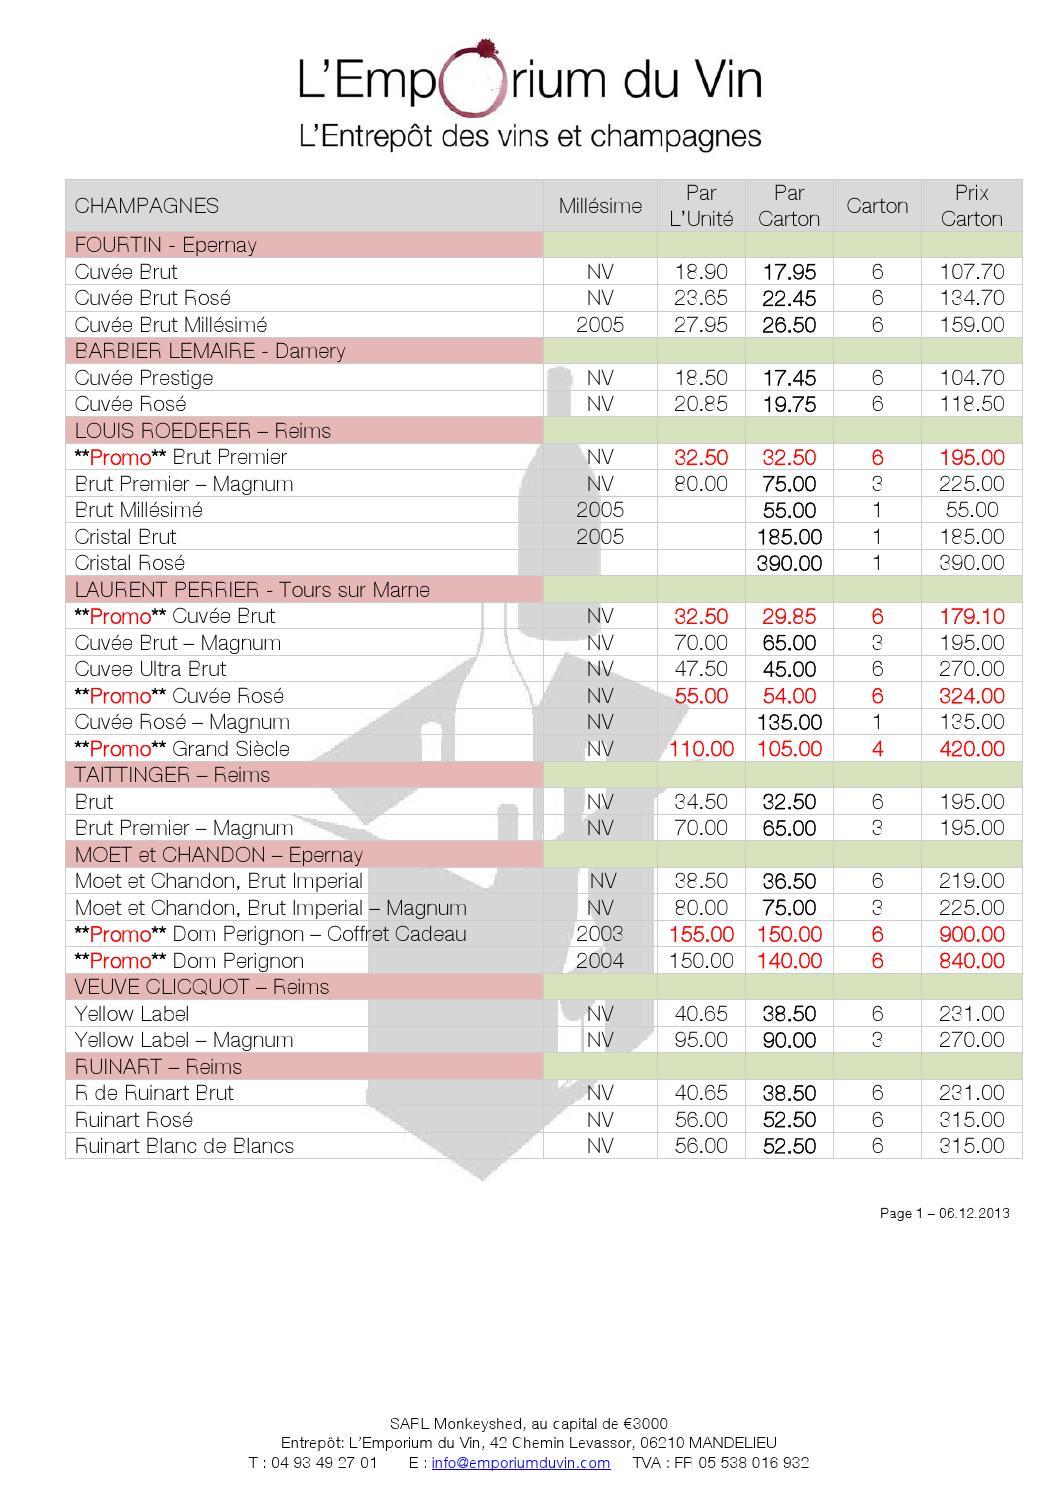 Wine list february 2014 by melanie ignatieff issuu for Table 52 wine list